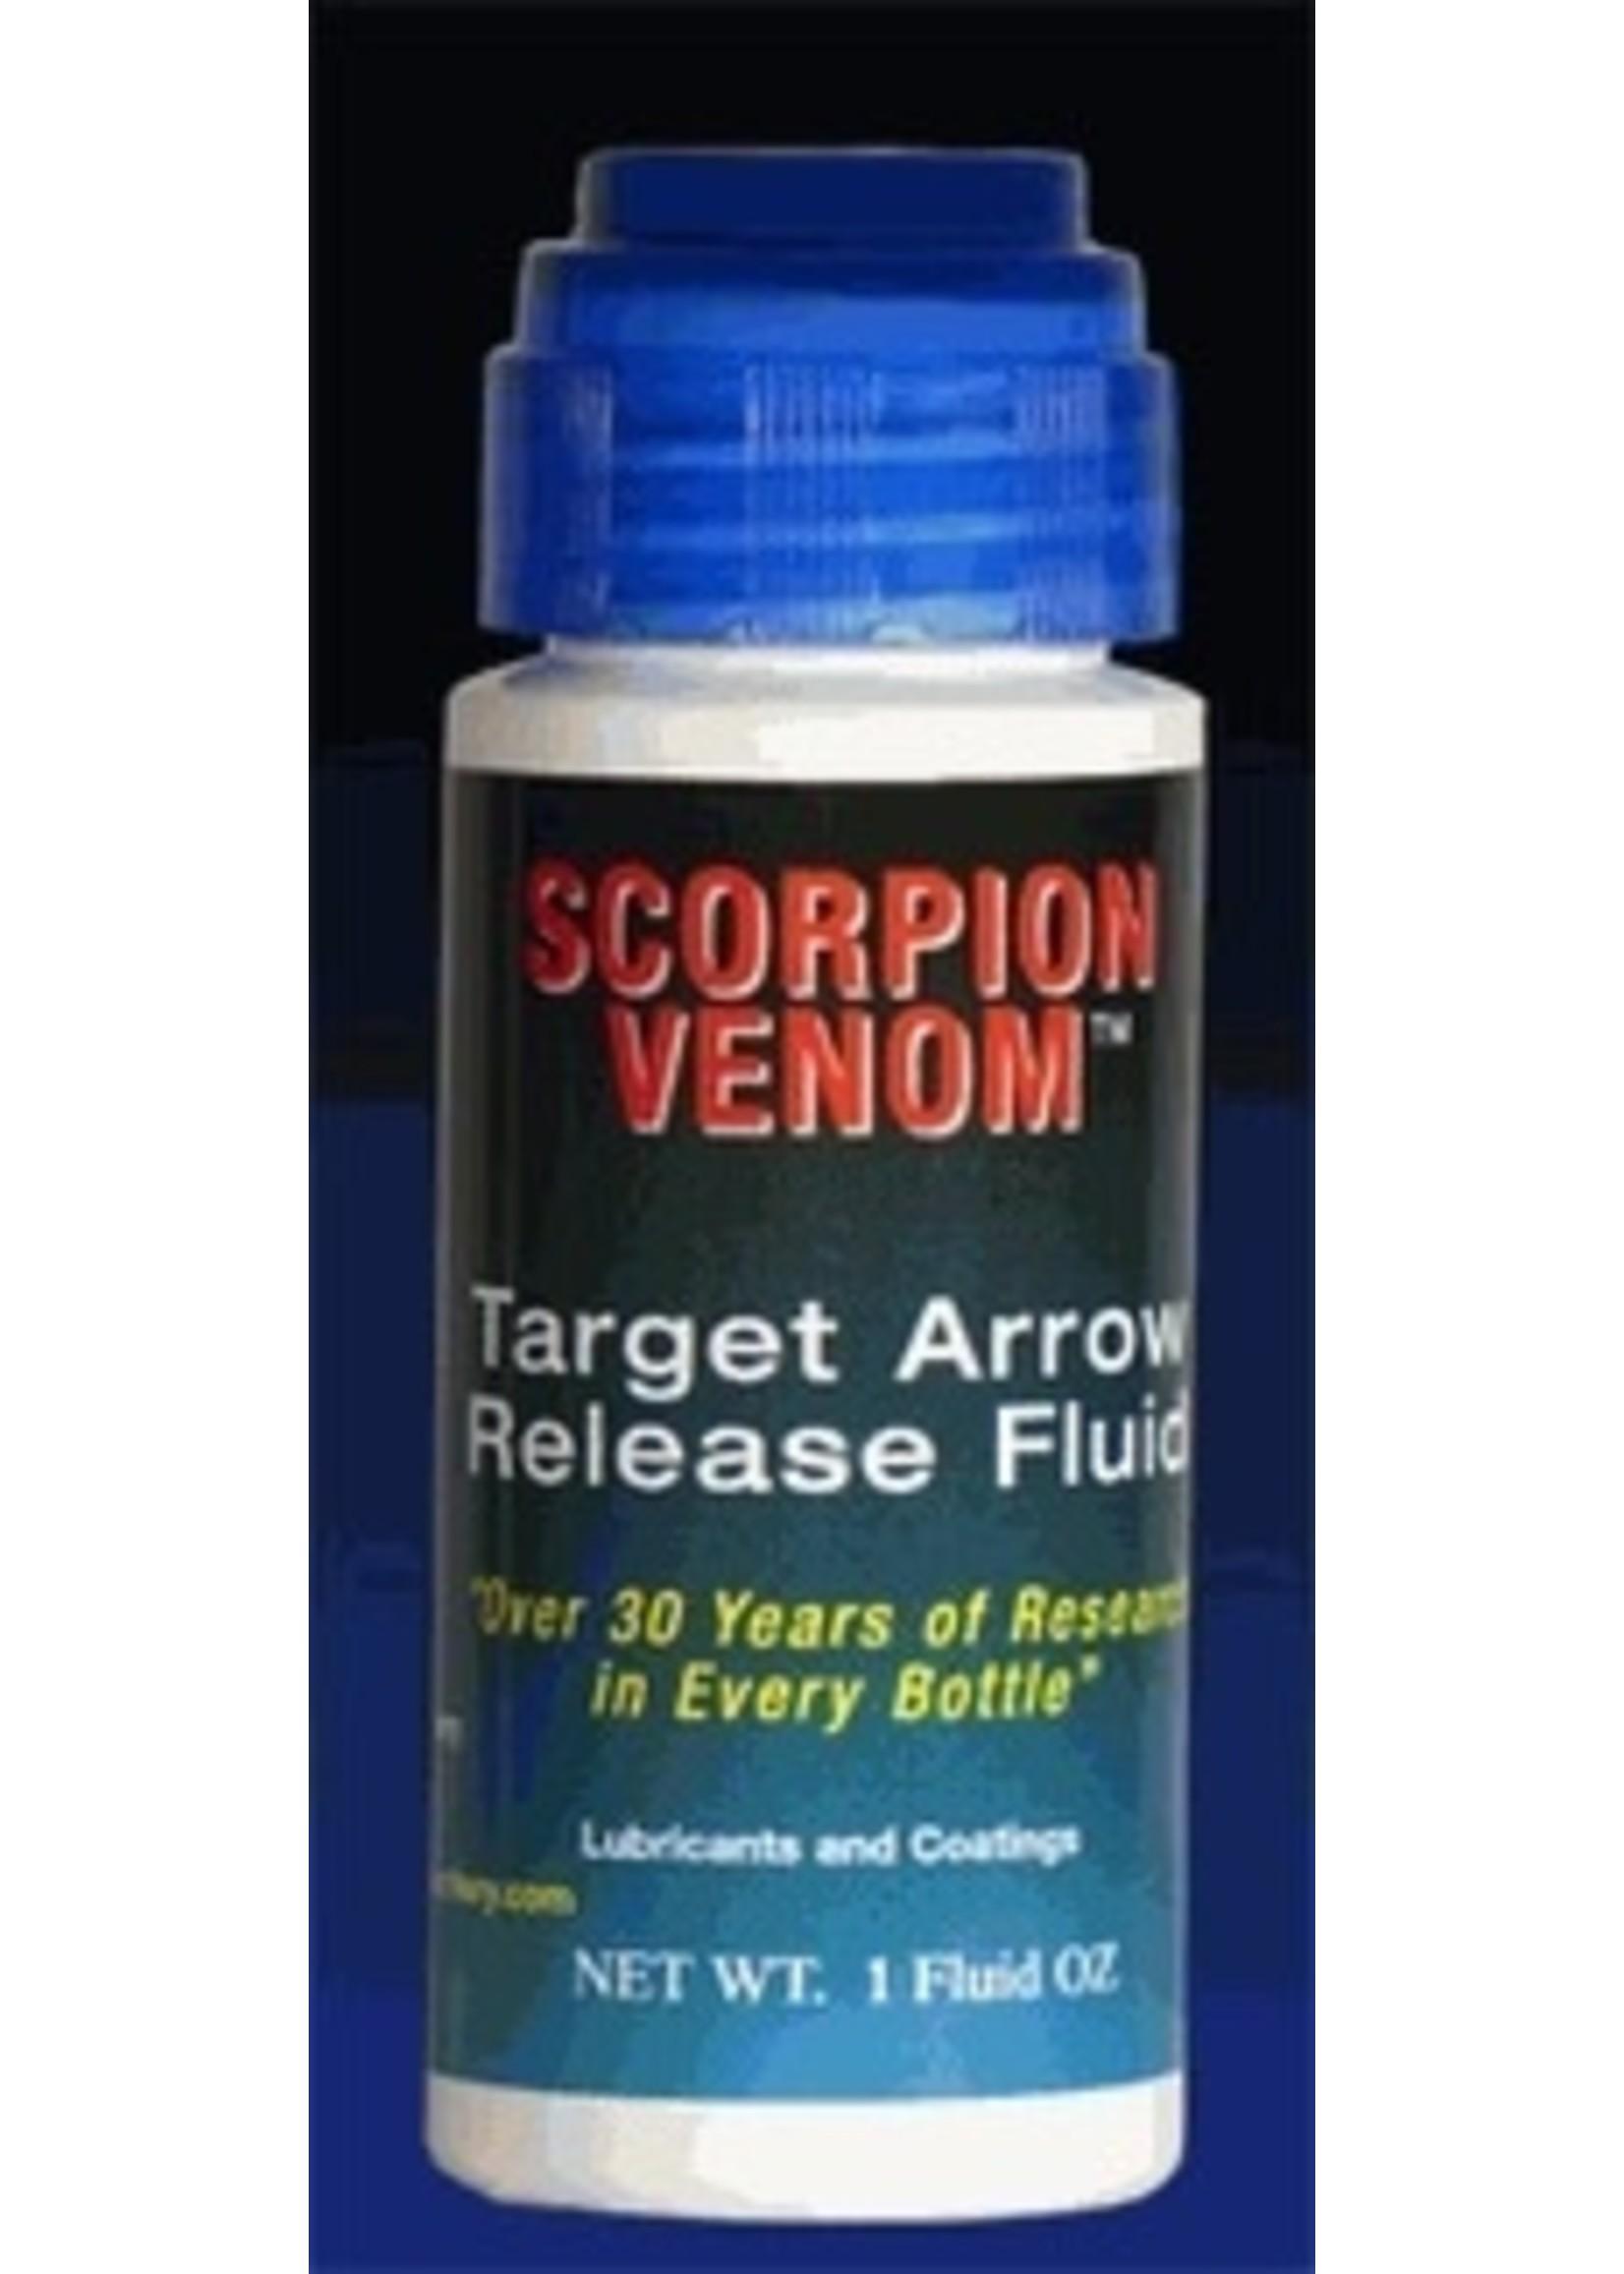 Scorpion Venom Scorpion Venom Arrow Lube